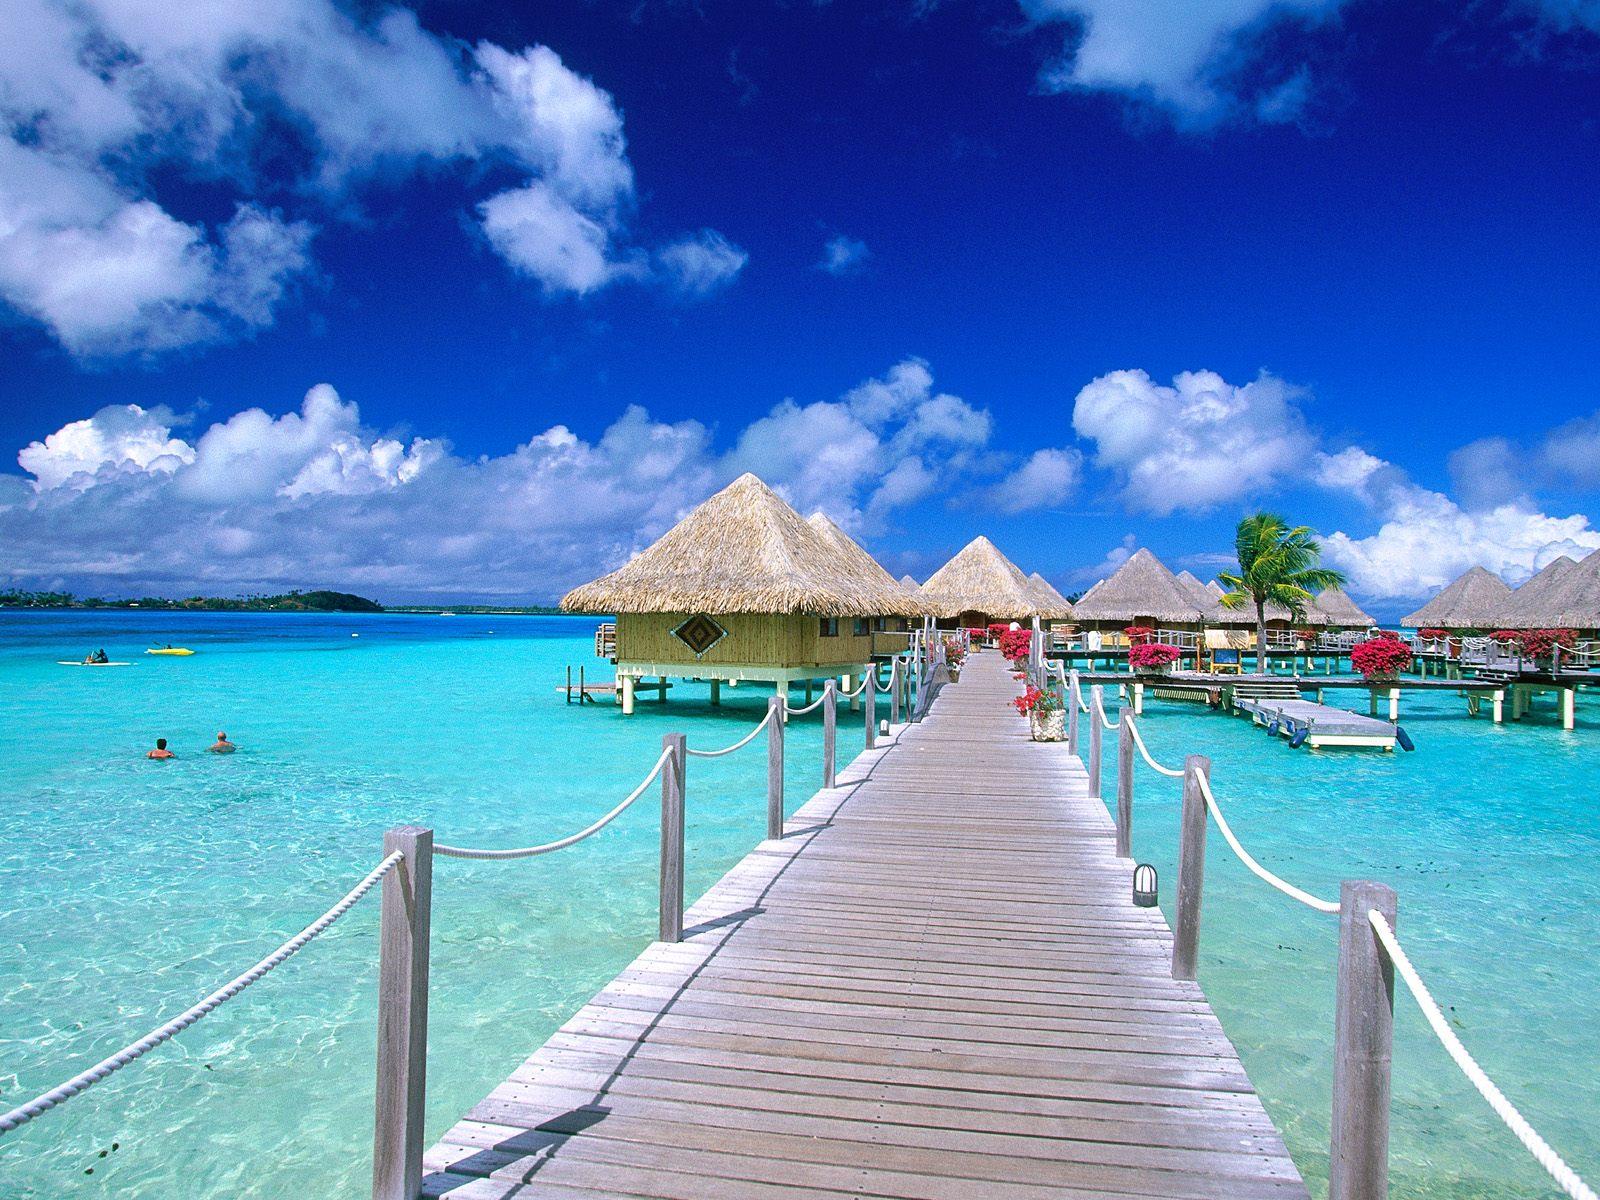 مالدیو سرزمین جزیره ها